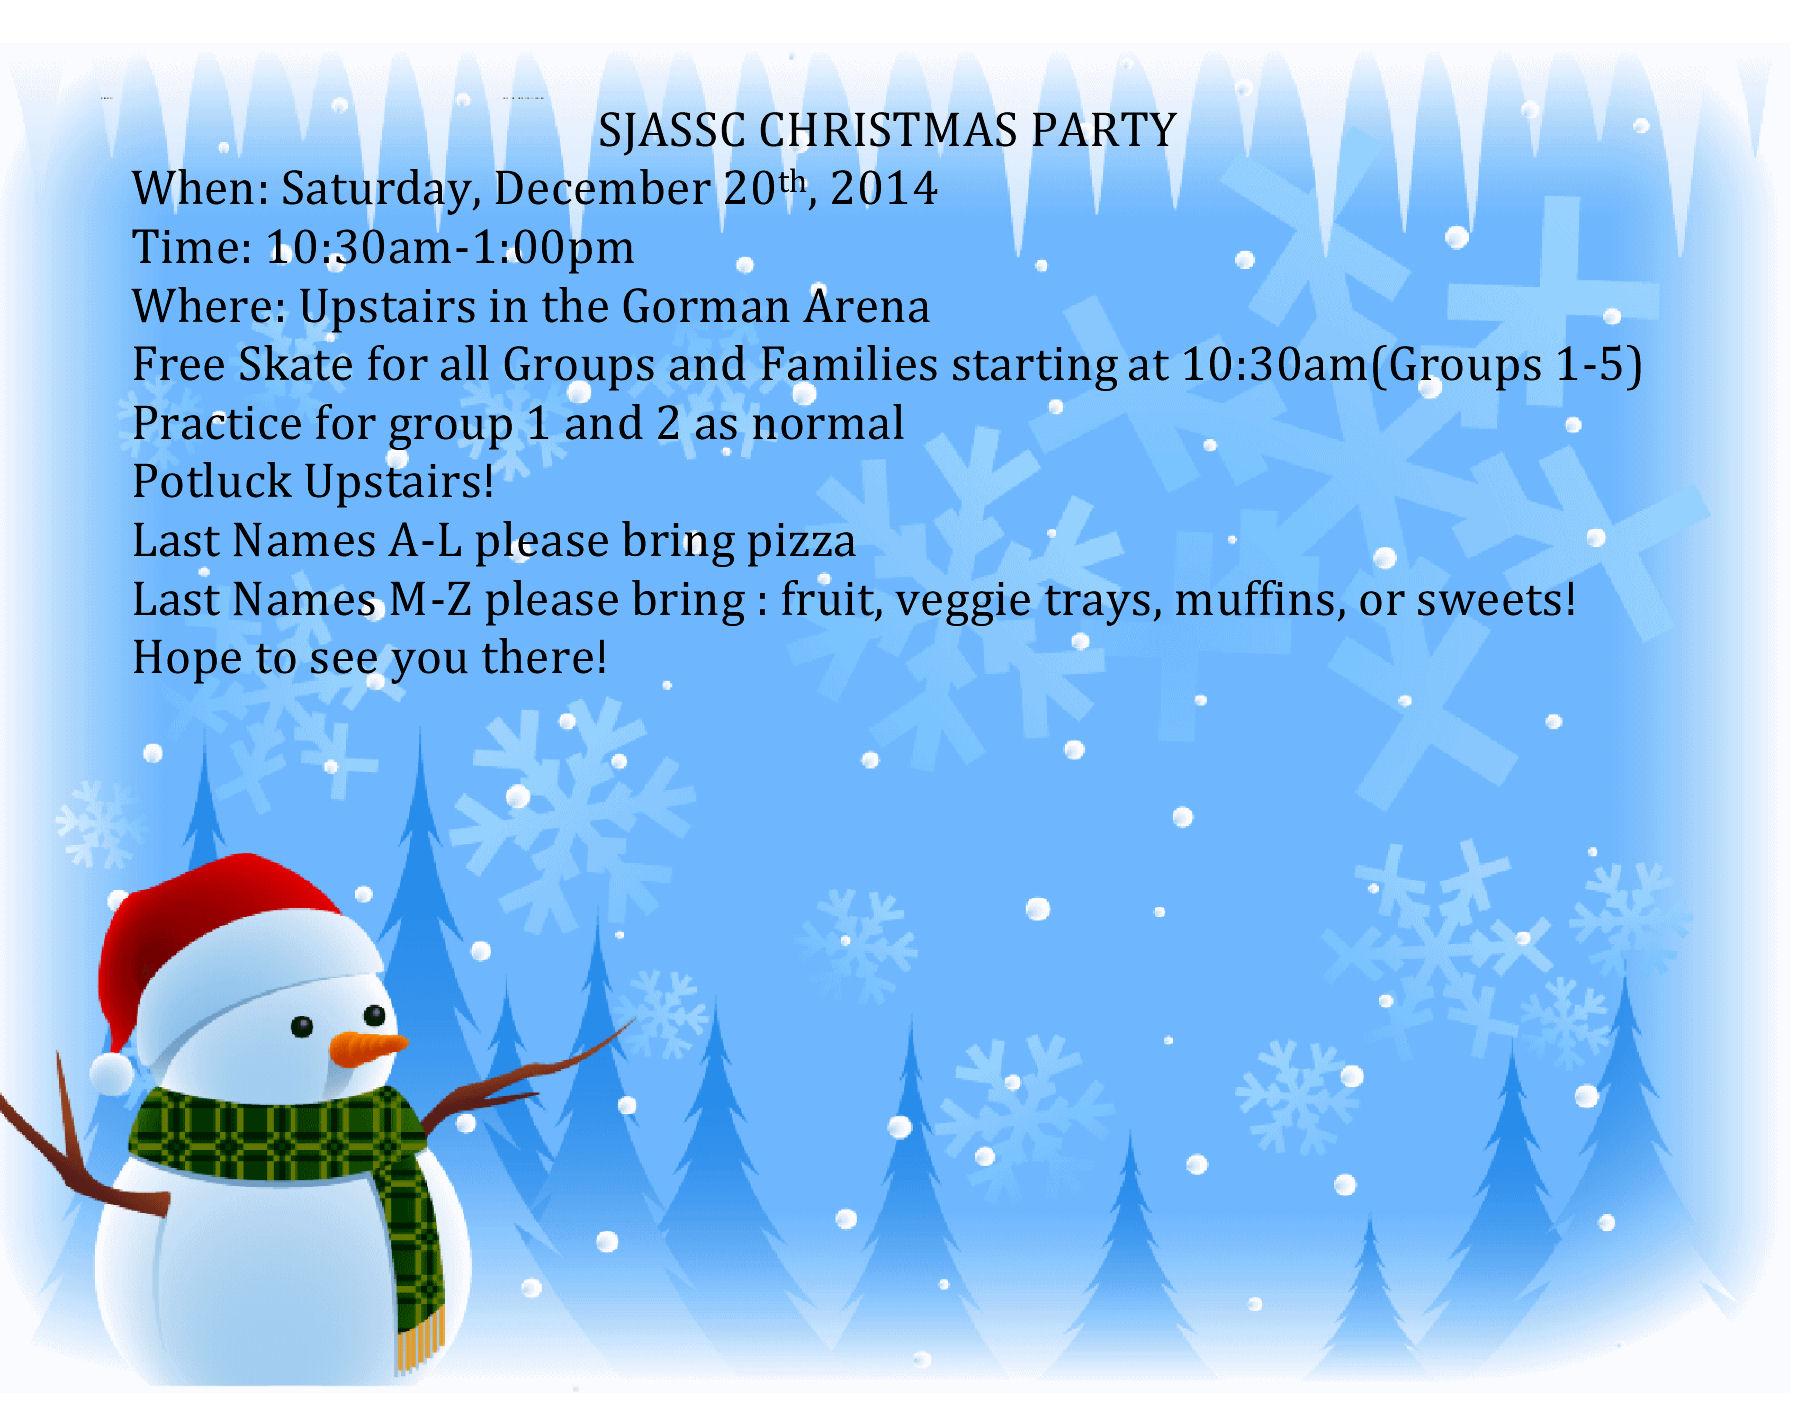 sjassc christmas party invite2014